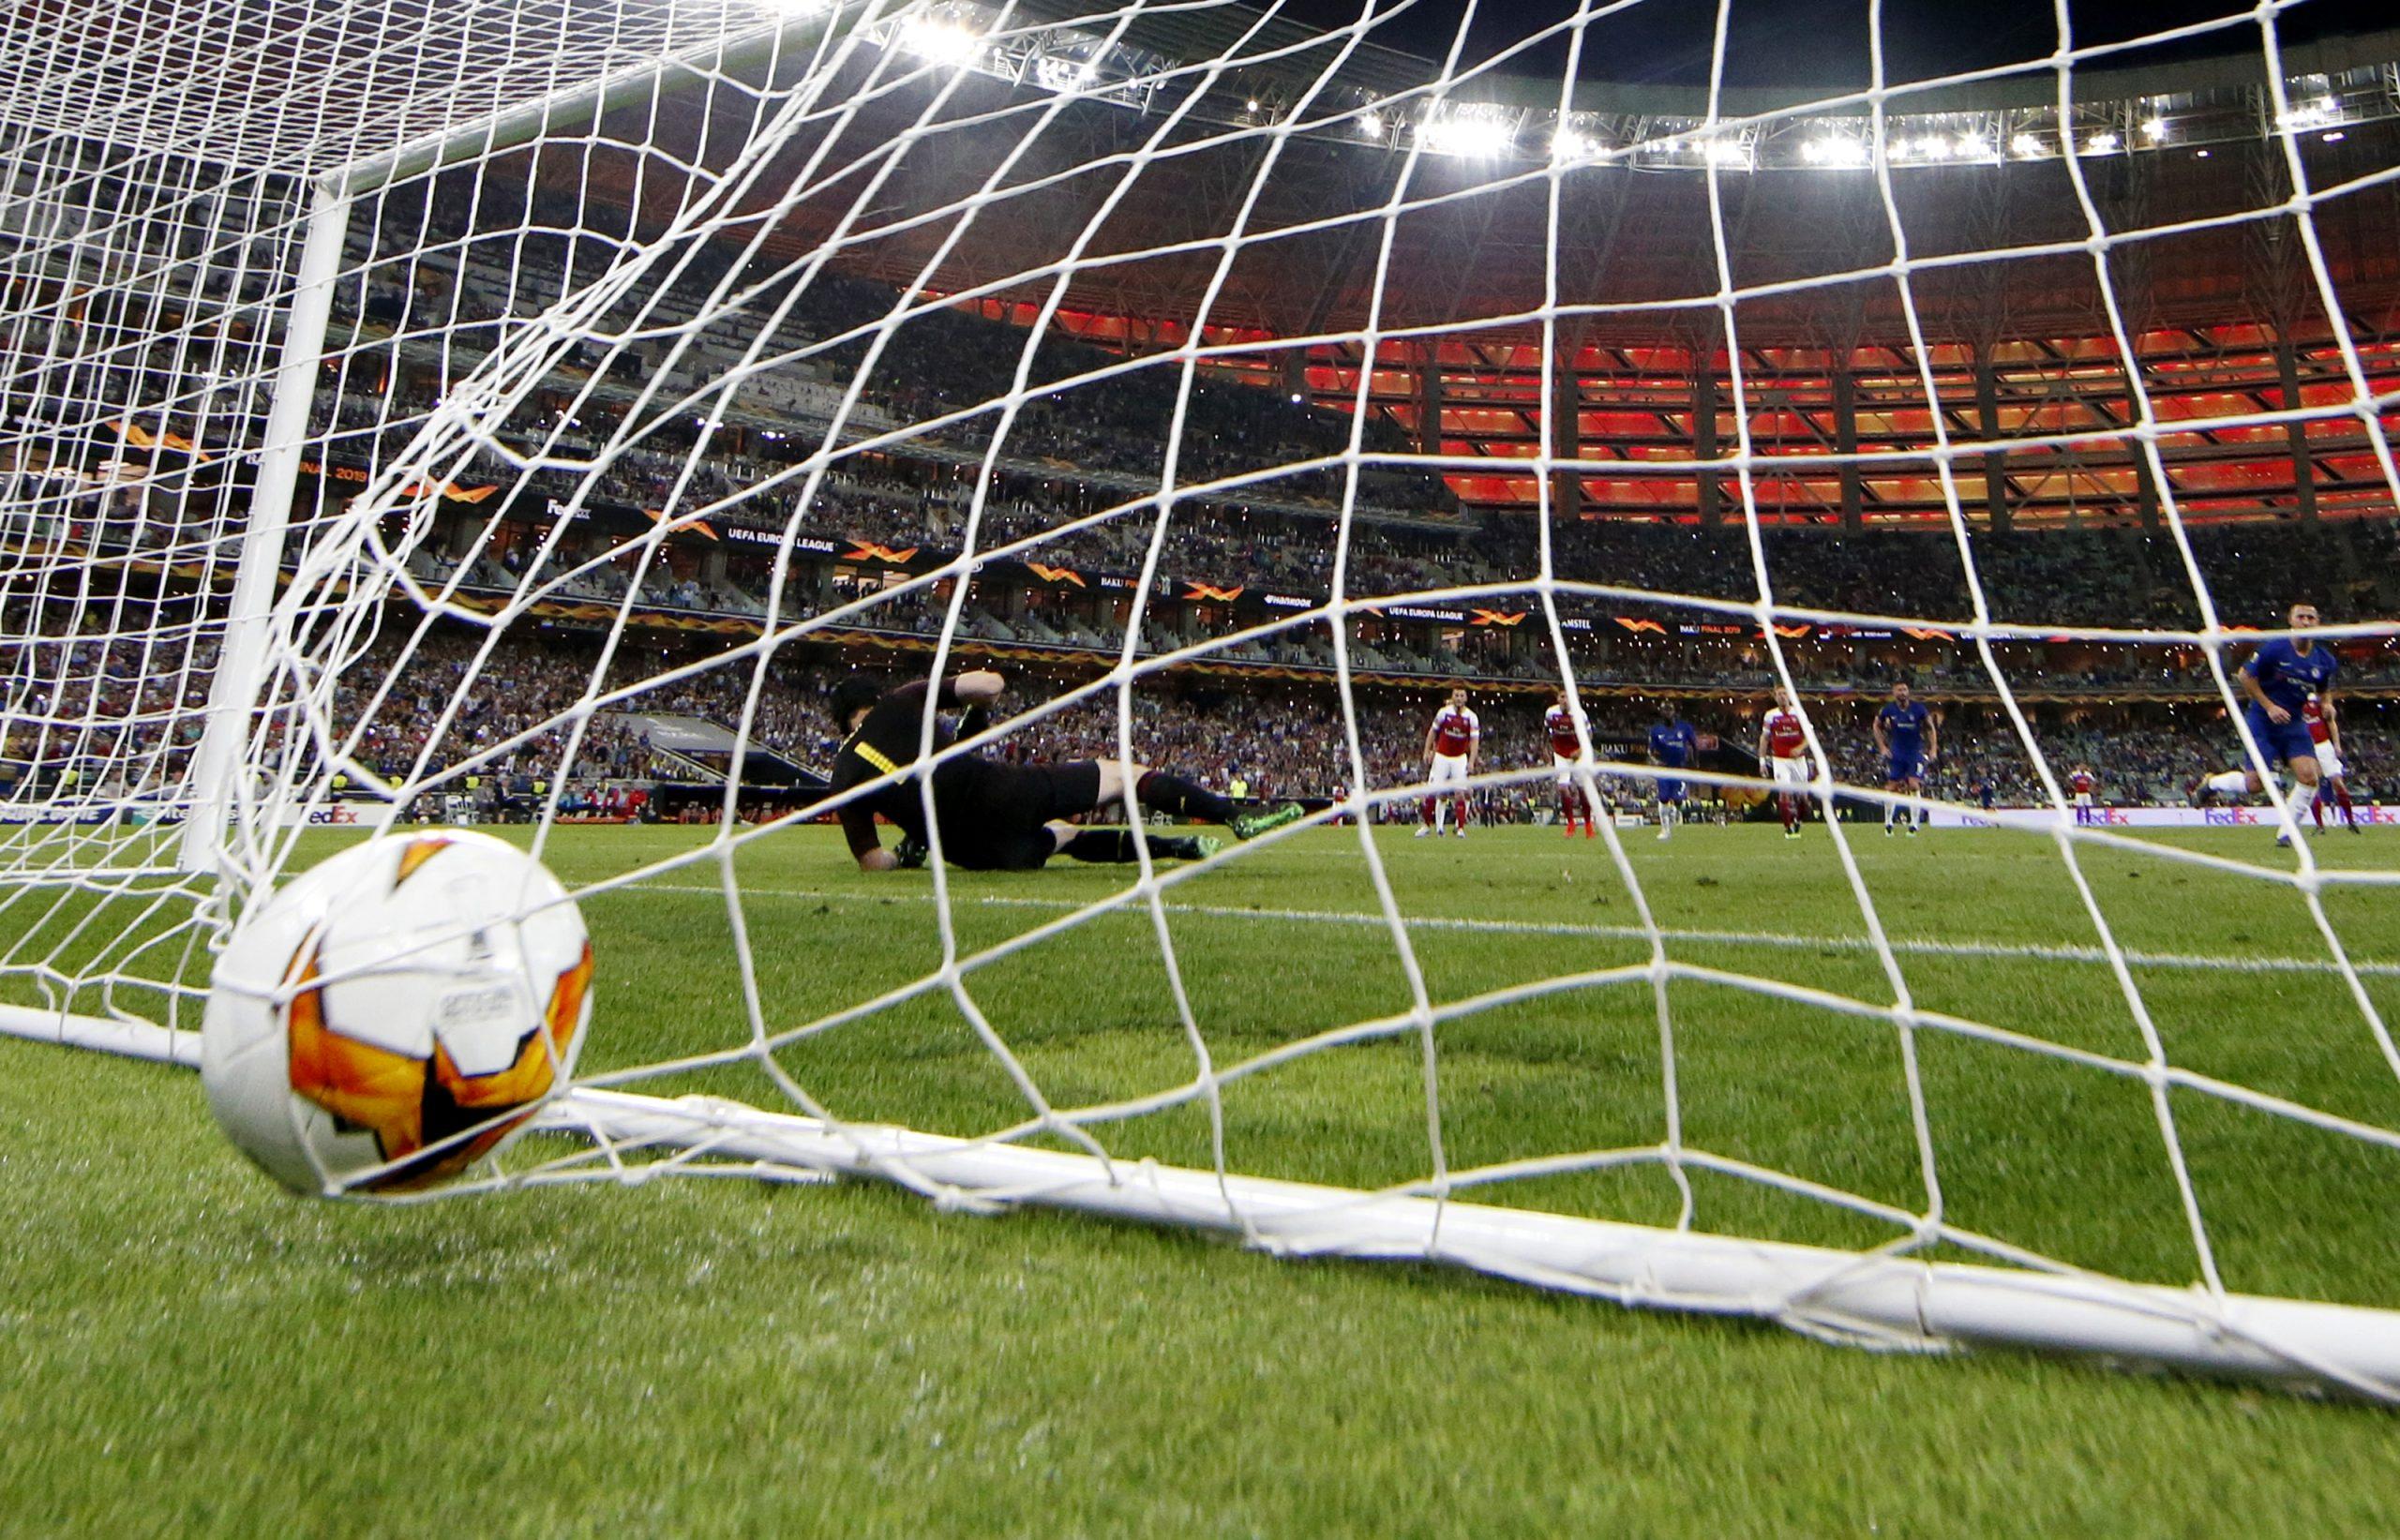 FSS protiv Superlige: Fudbal ne sme da pravi razliku na bogate i siromašne 1